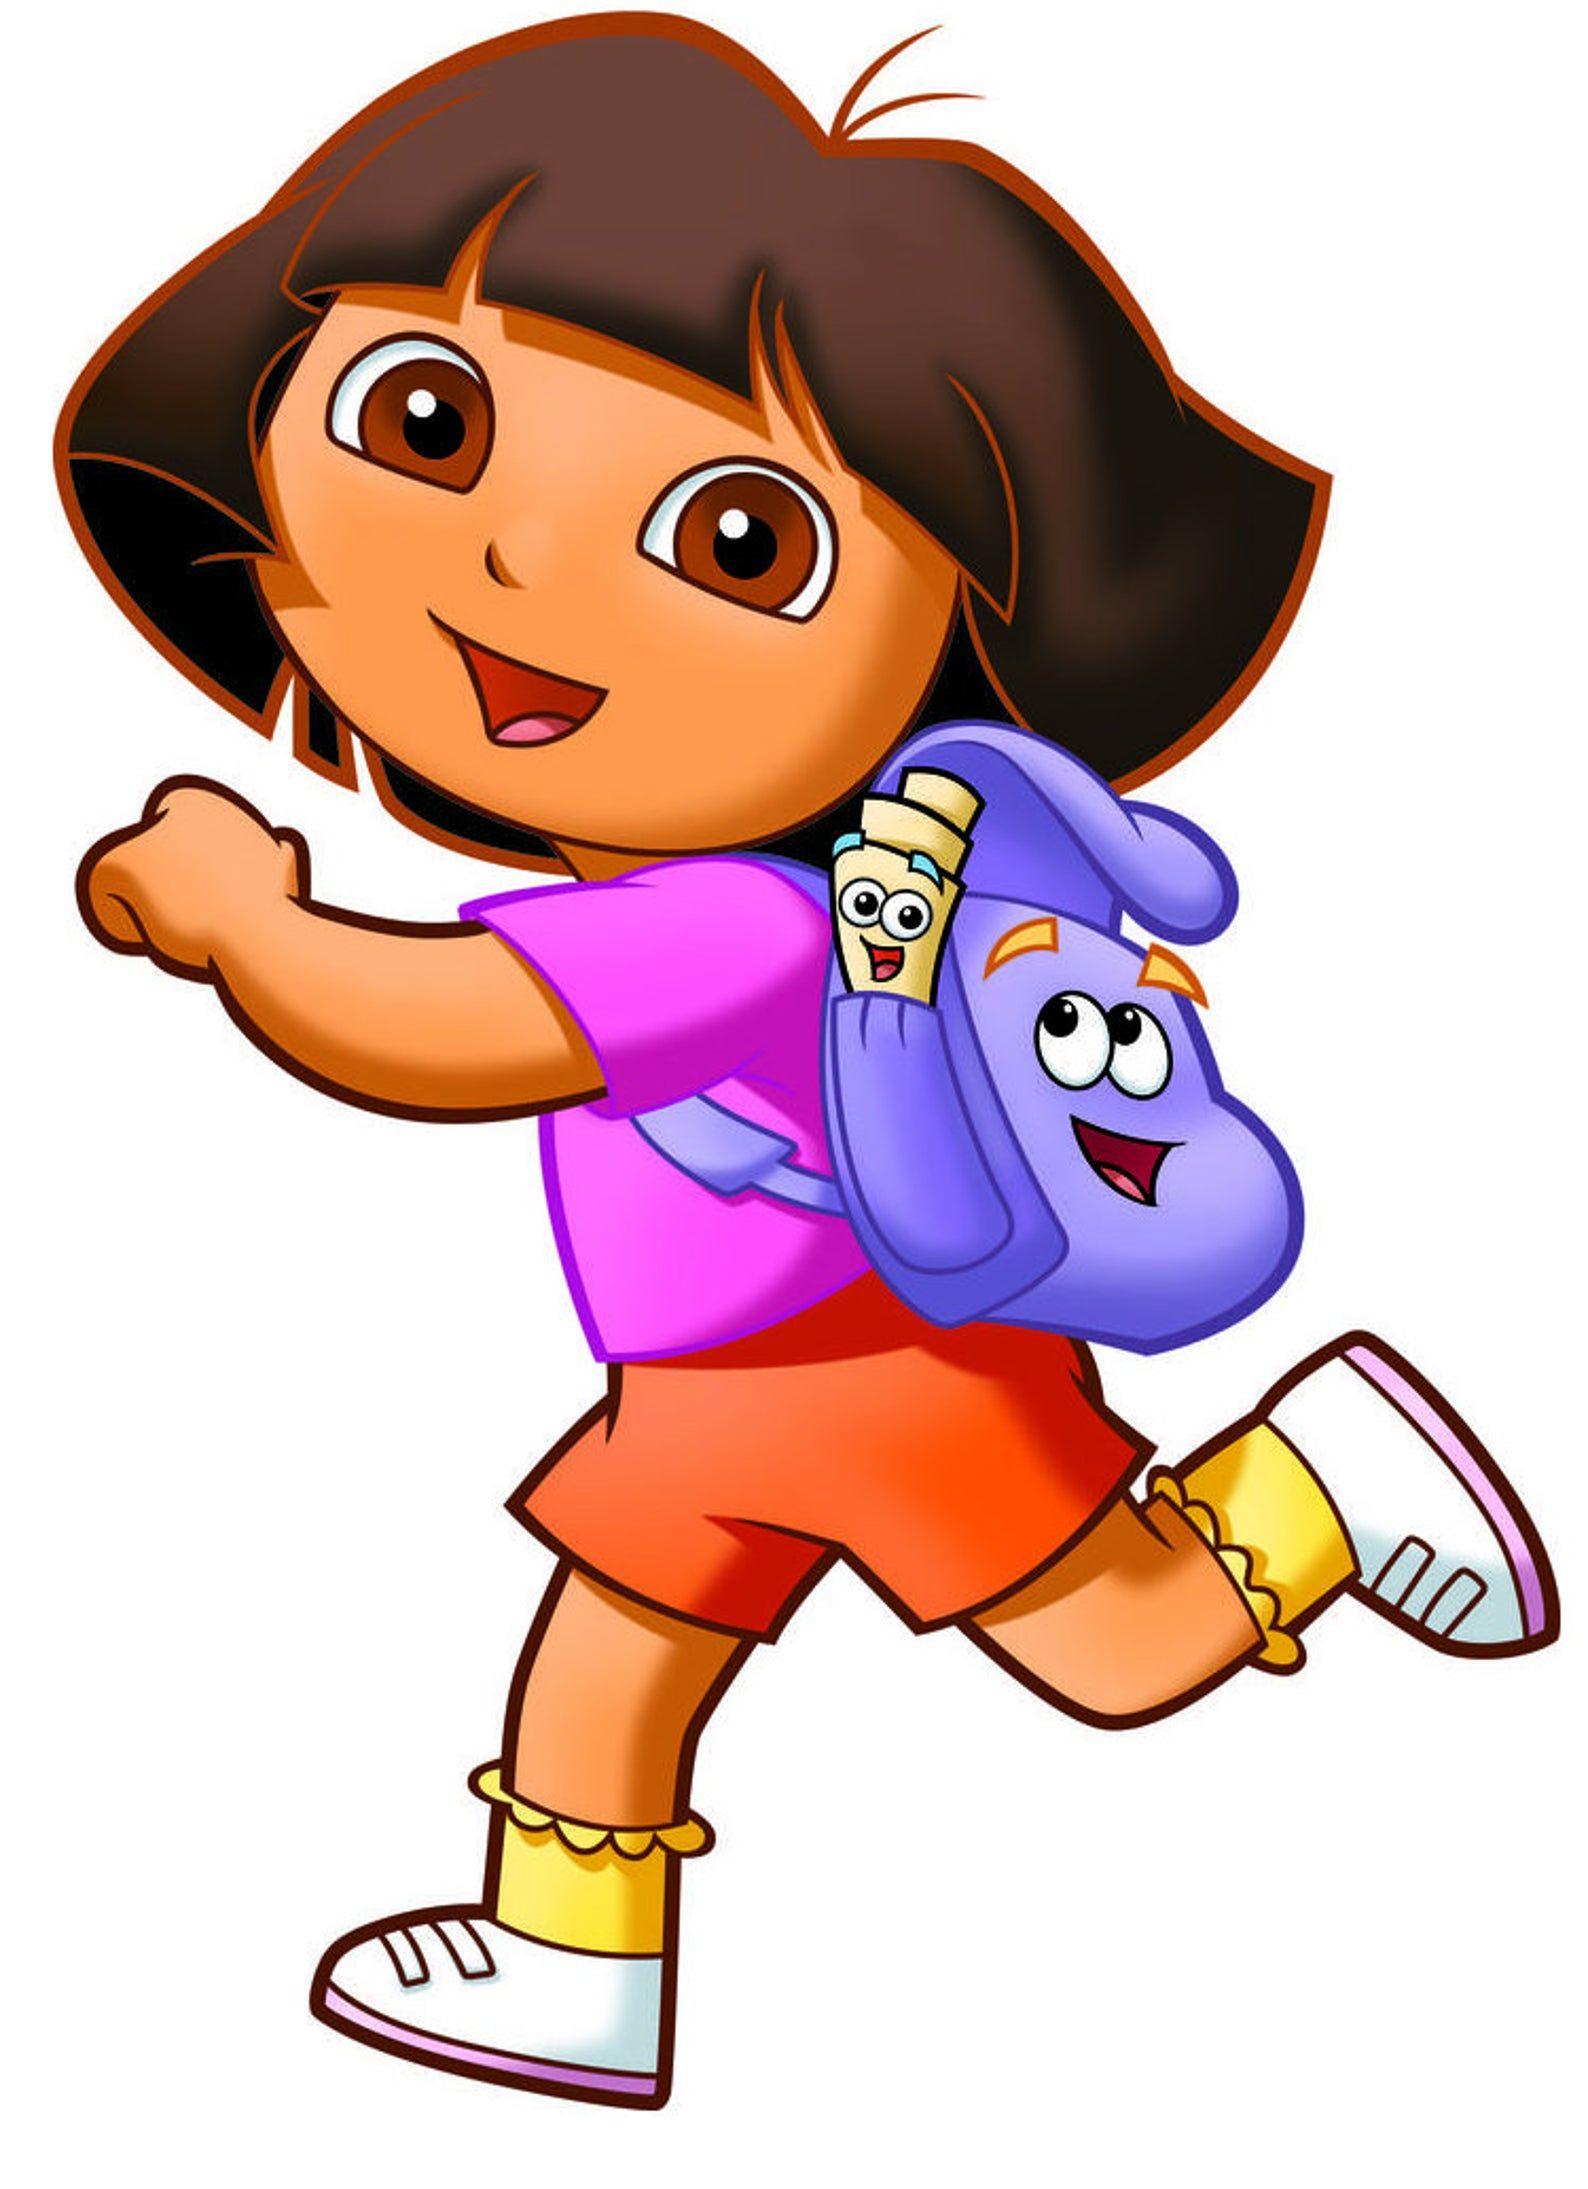 Dora Explorer 5x6 All Color Iron On Transfer Etsy In 2021 Dora Cartoon Dora Wallpaper Dora The Explorer